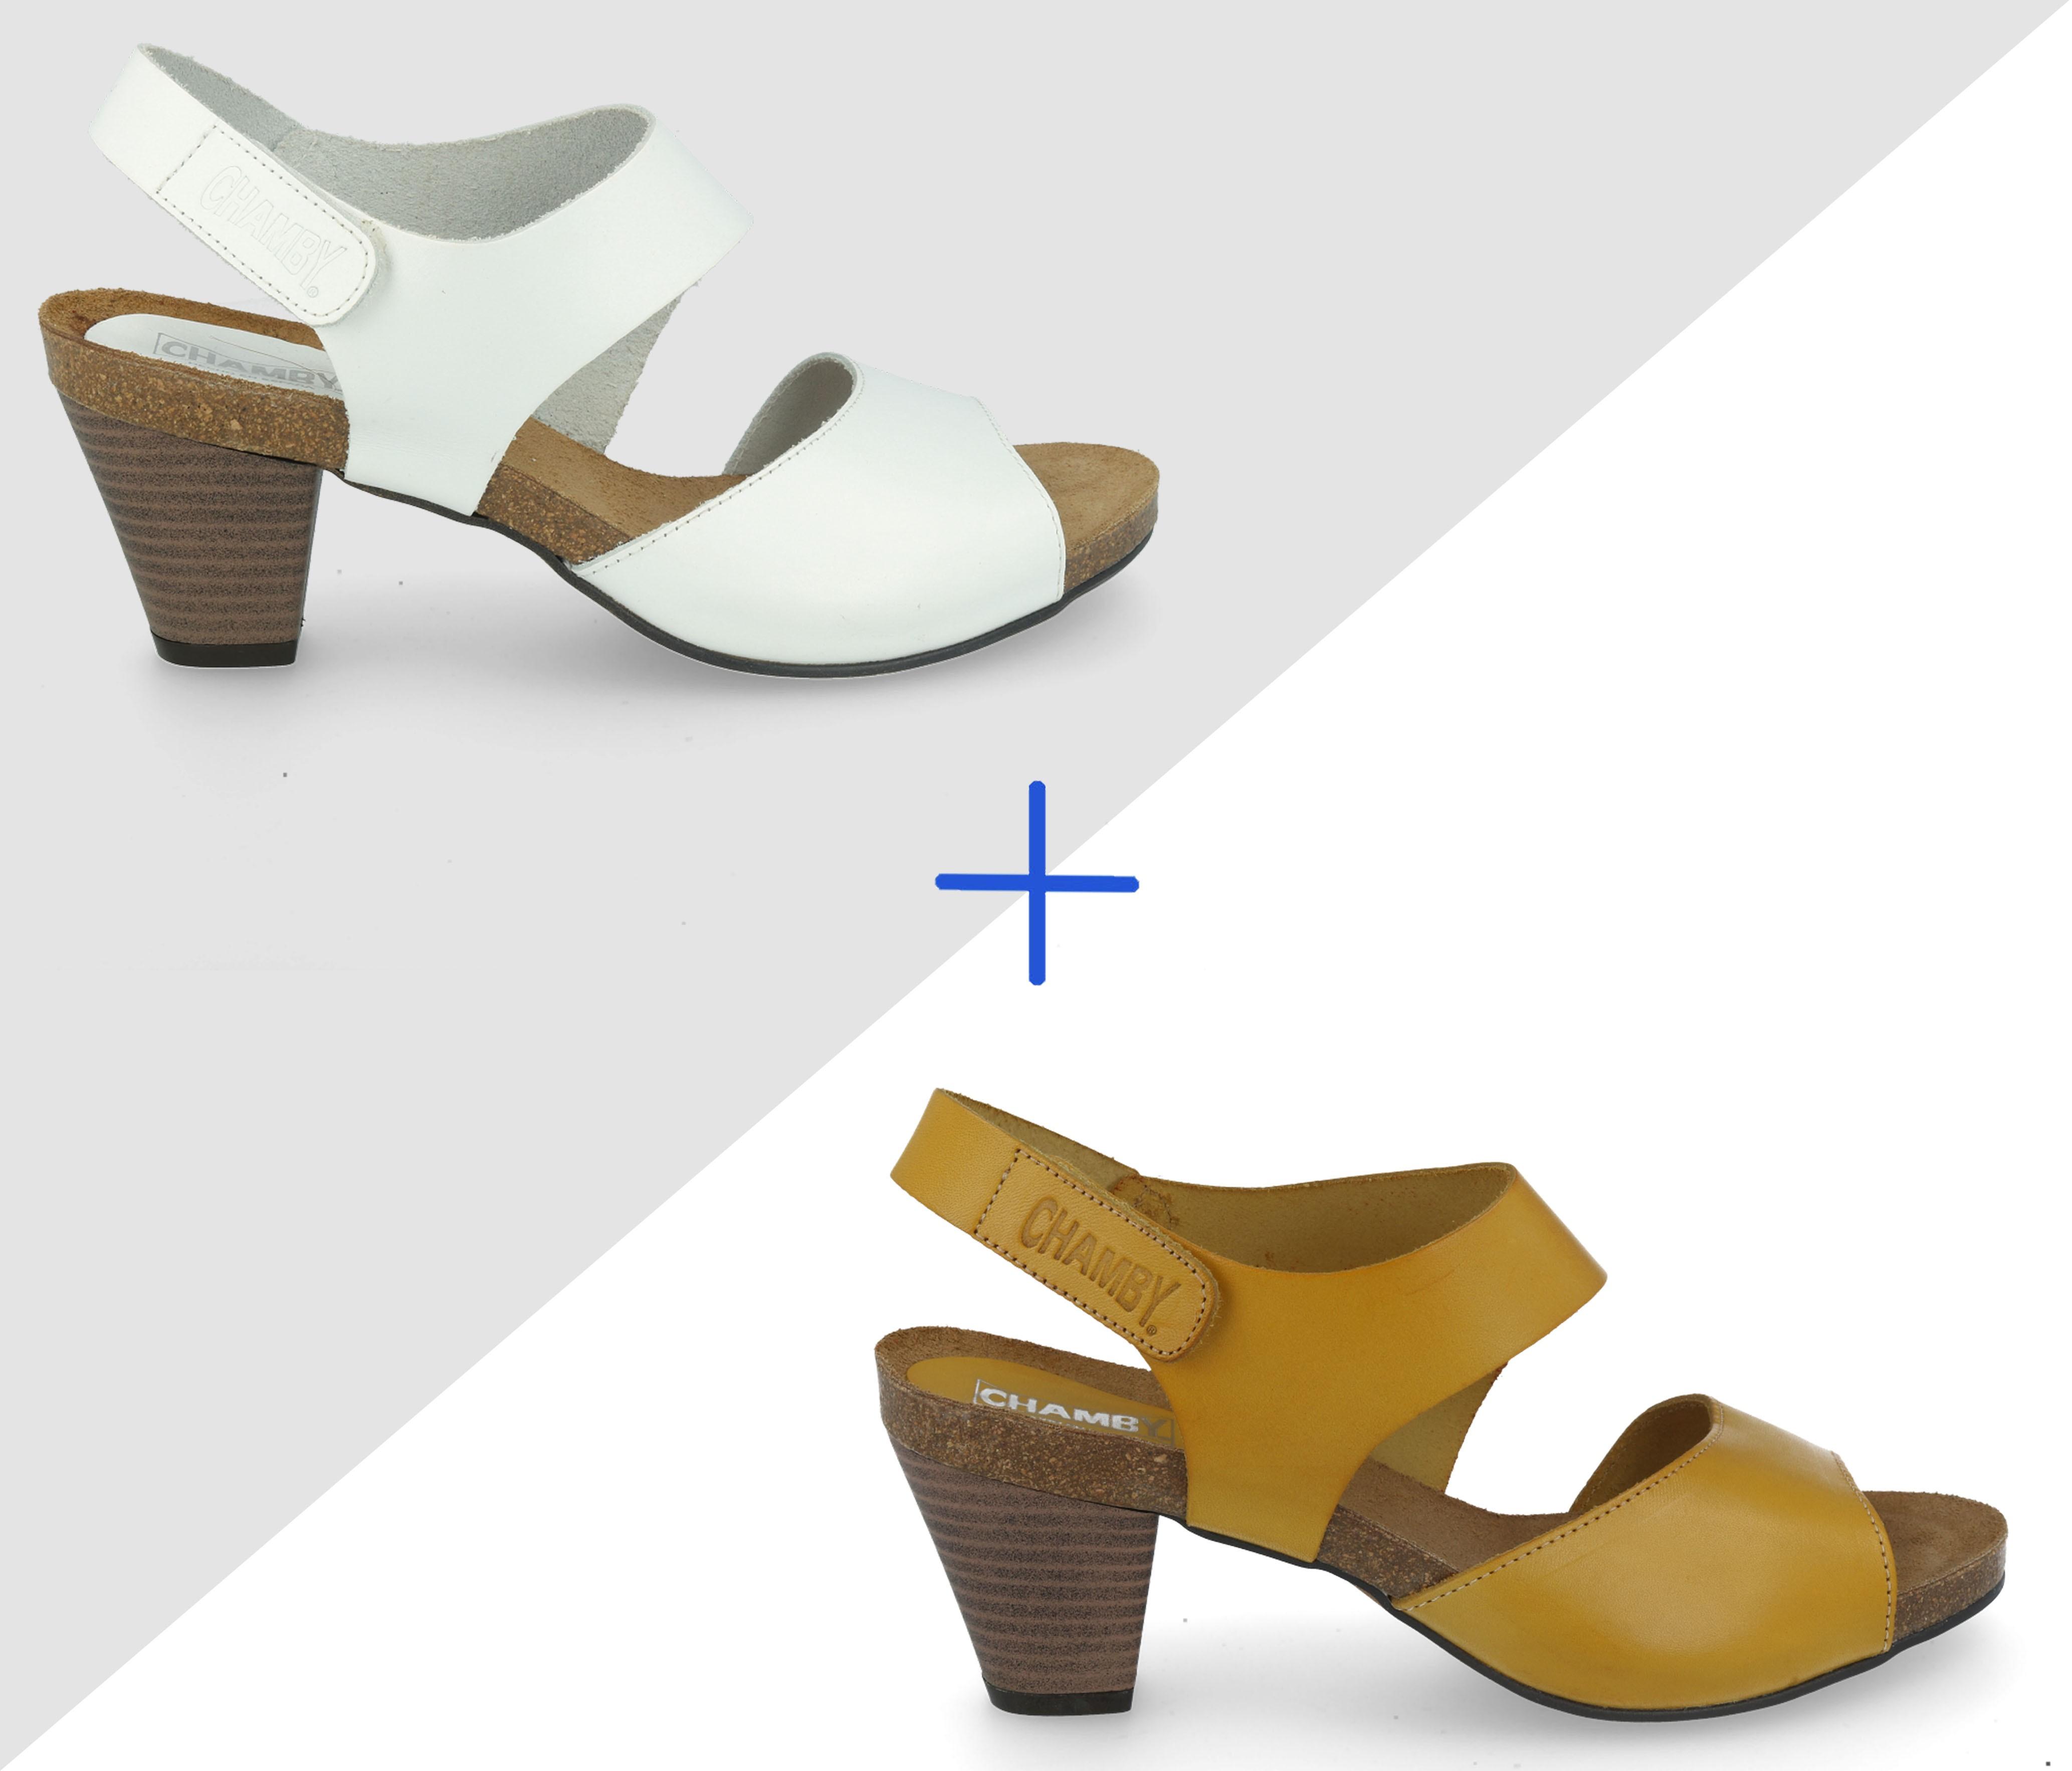 Confort Pack Ahorro Cuña Piel Sandalia Comodas Nvm0w8nO